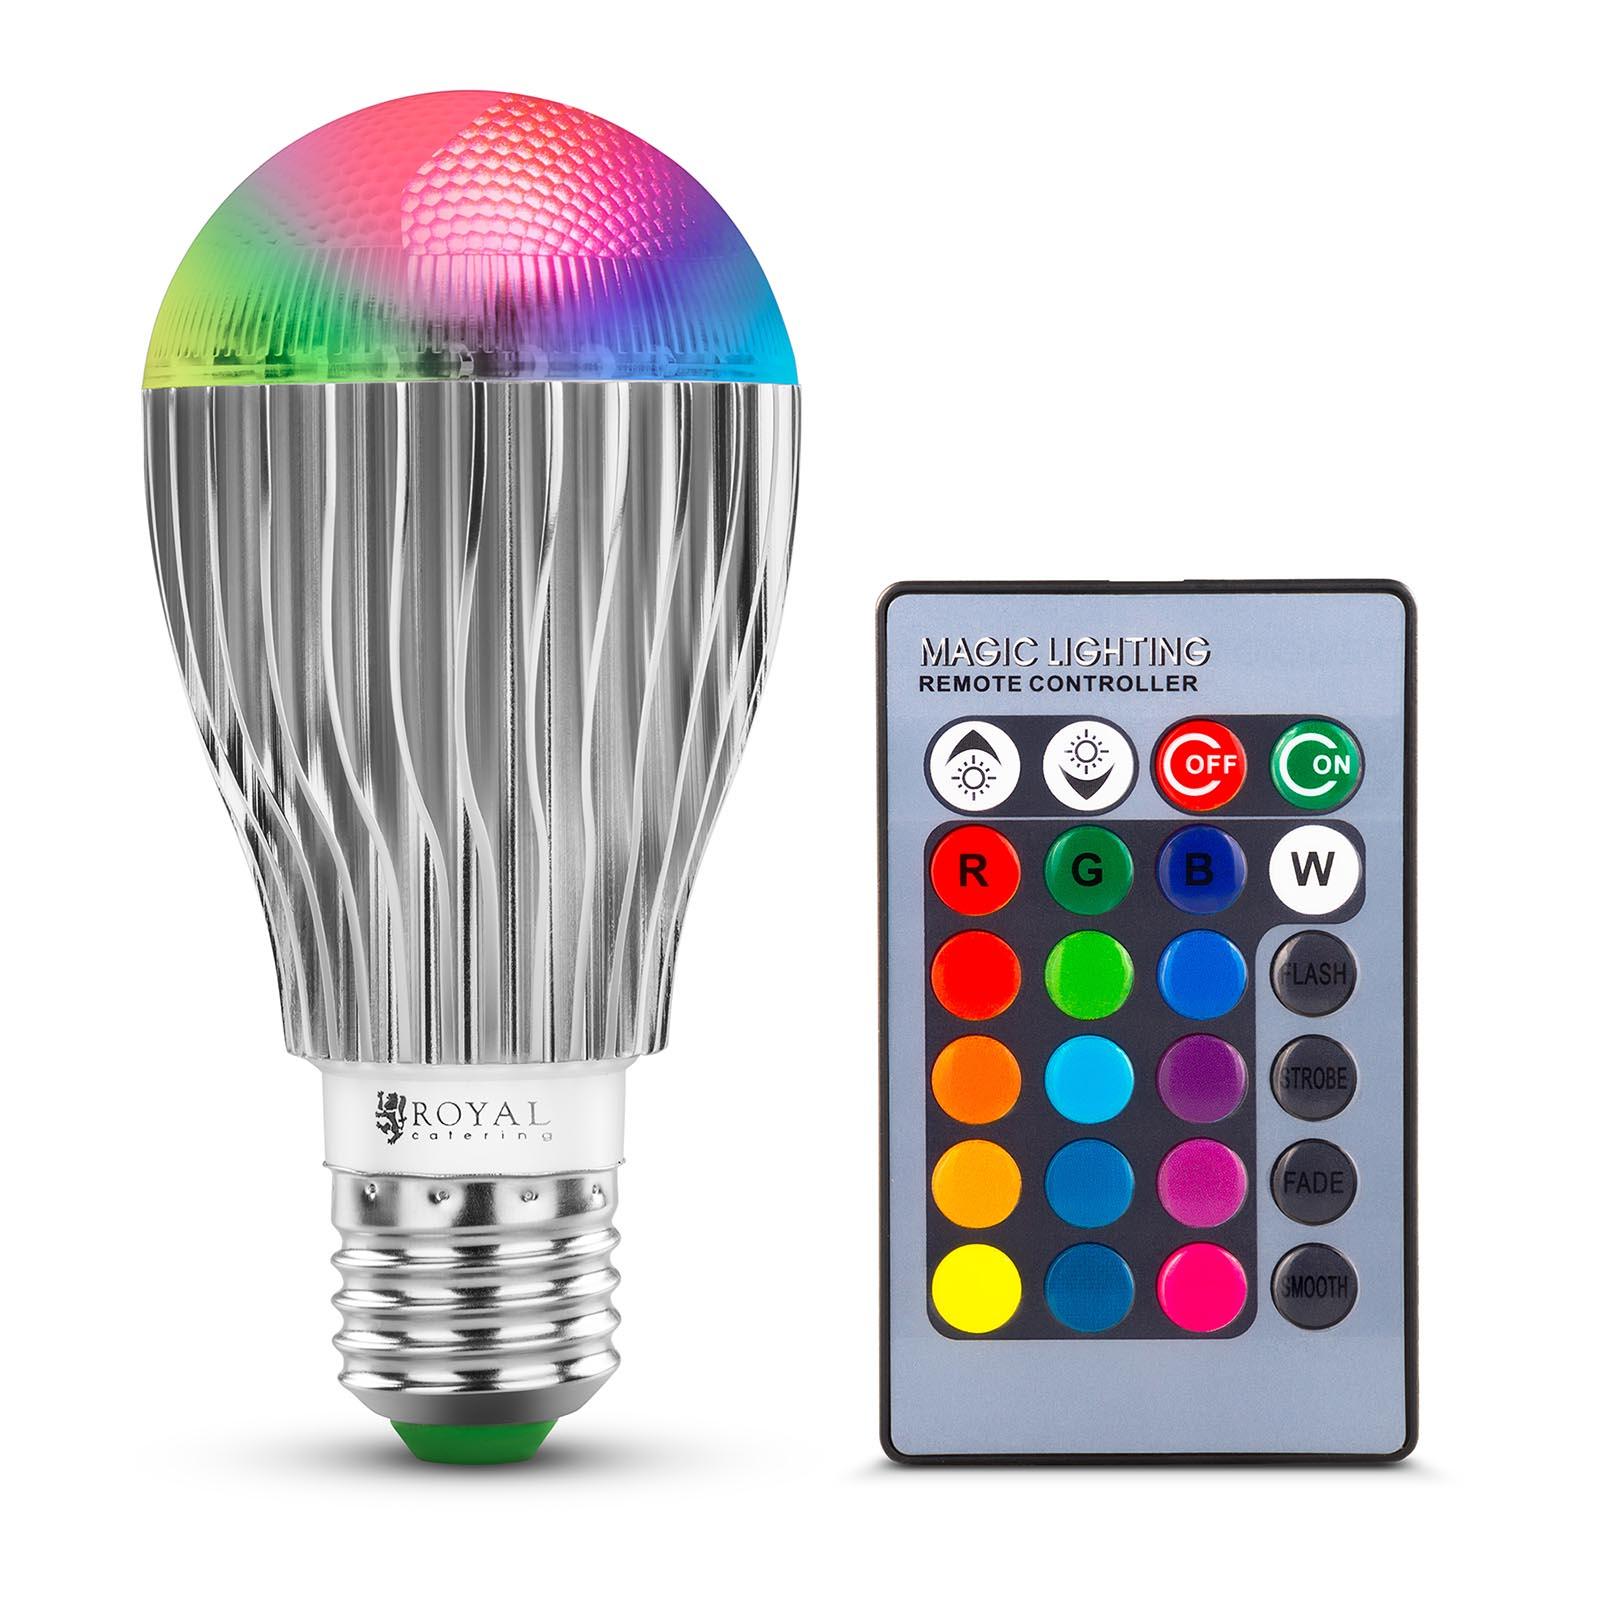 Royal Catering RGB-LED-Lampe mit Fernbedienung - 16 Farbeinstellungen - 5 W 10011129